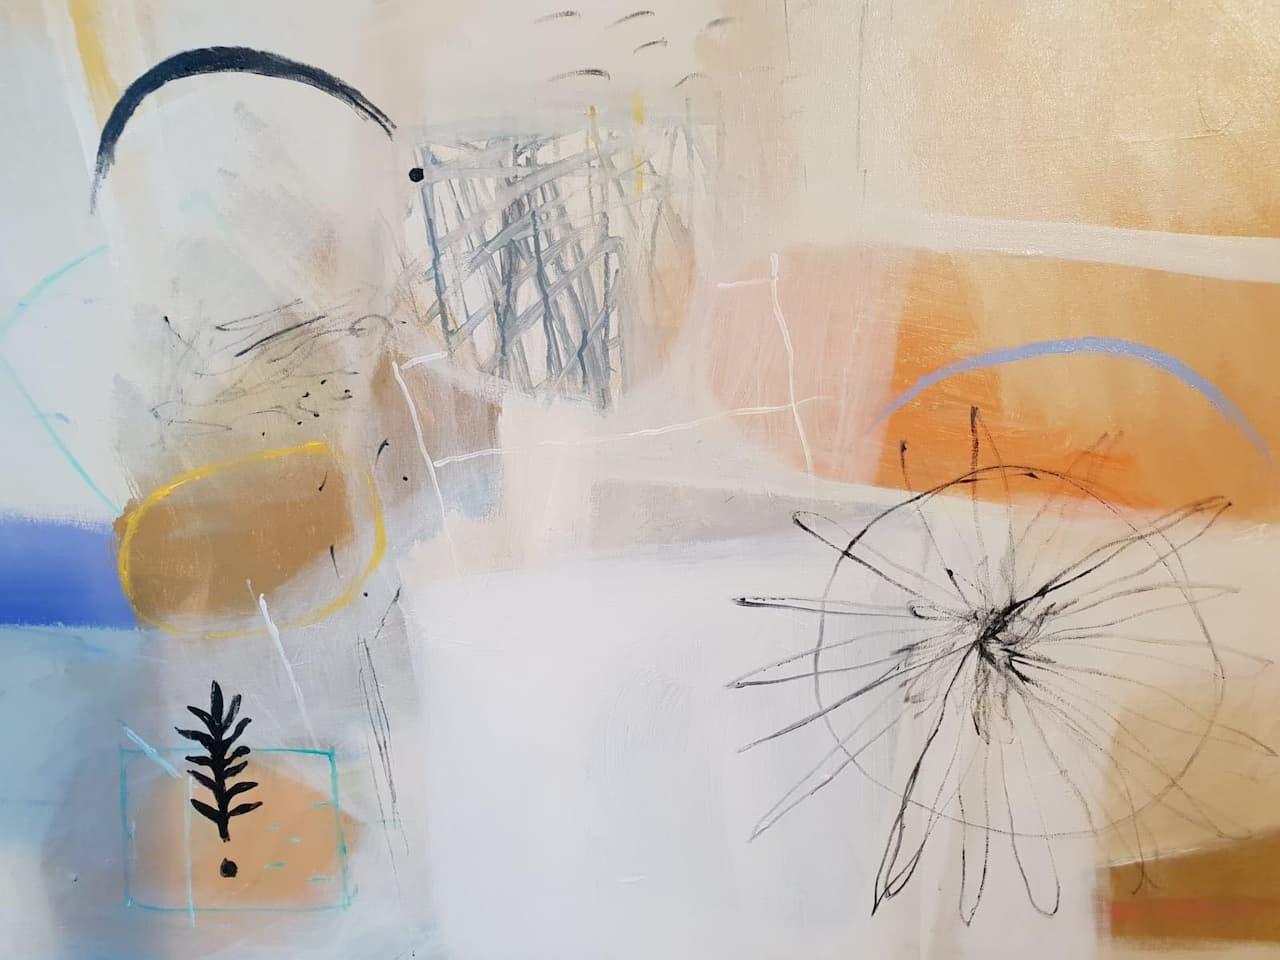 Buy Rosa Padilla's artworks at Balthazar Project Gallery